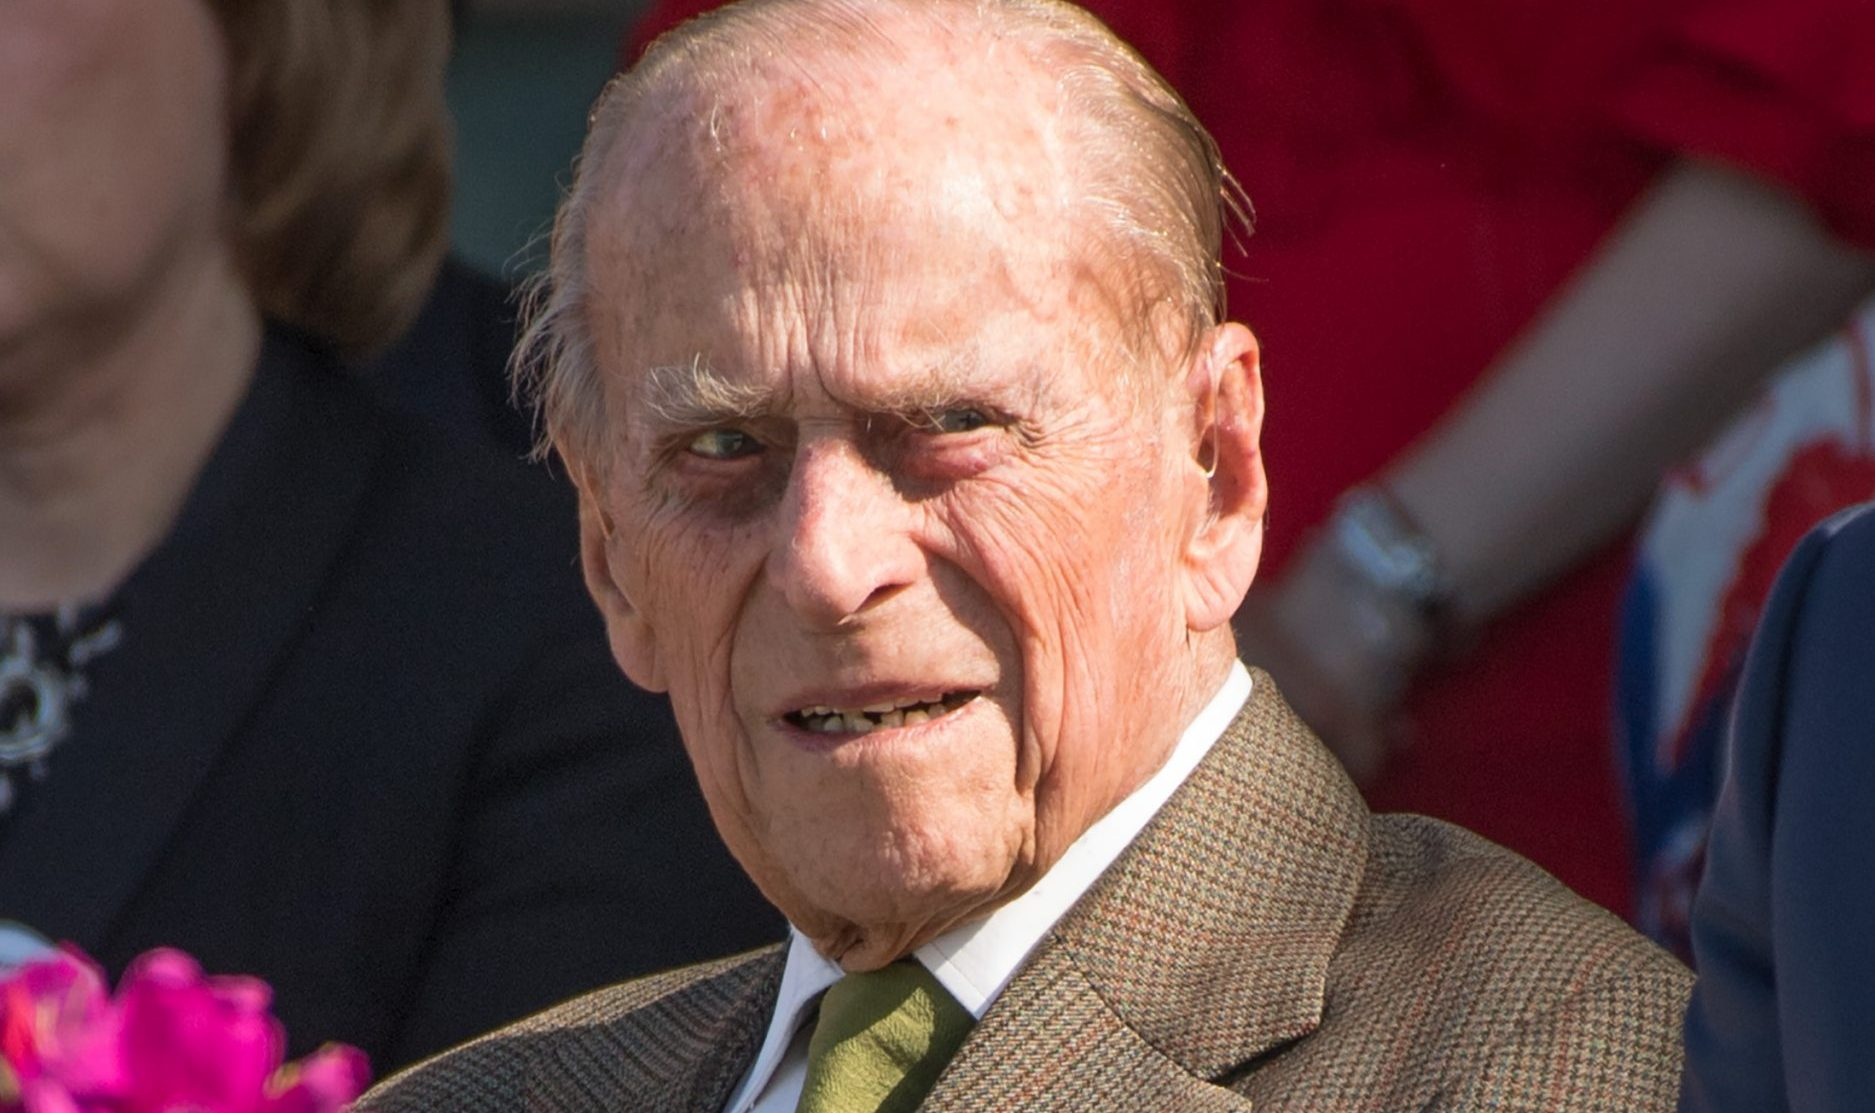 Prince Philip is NOT dead, confirms Buckingham Palace amid coronavirus fears